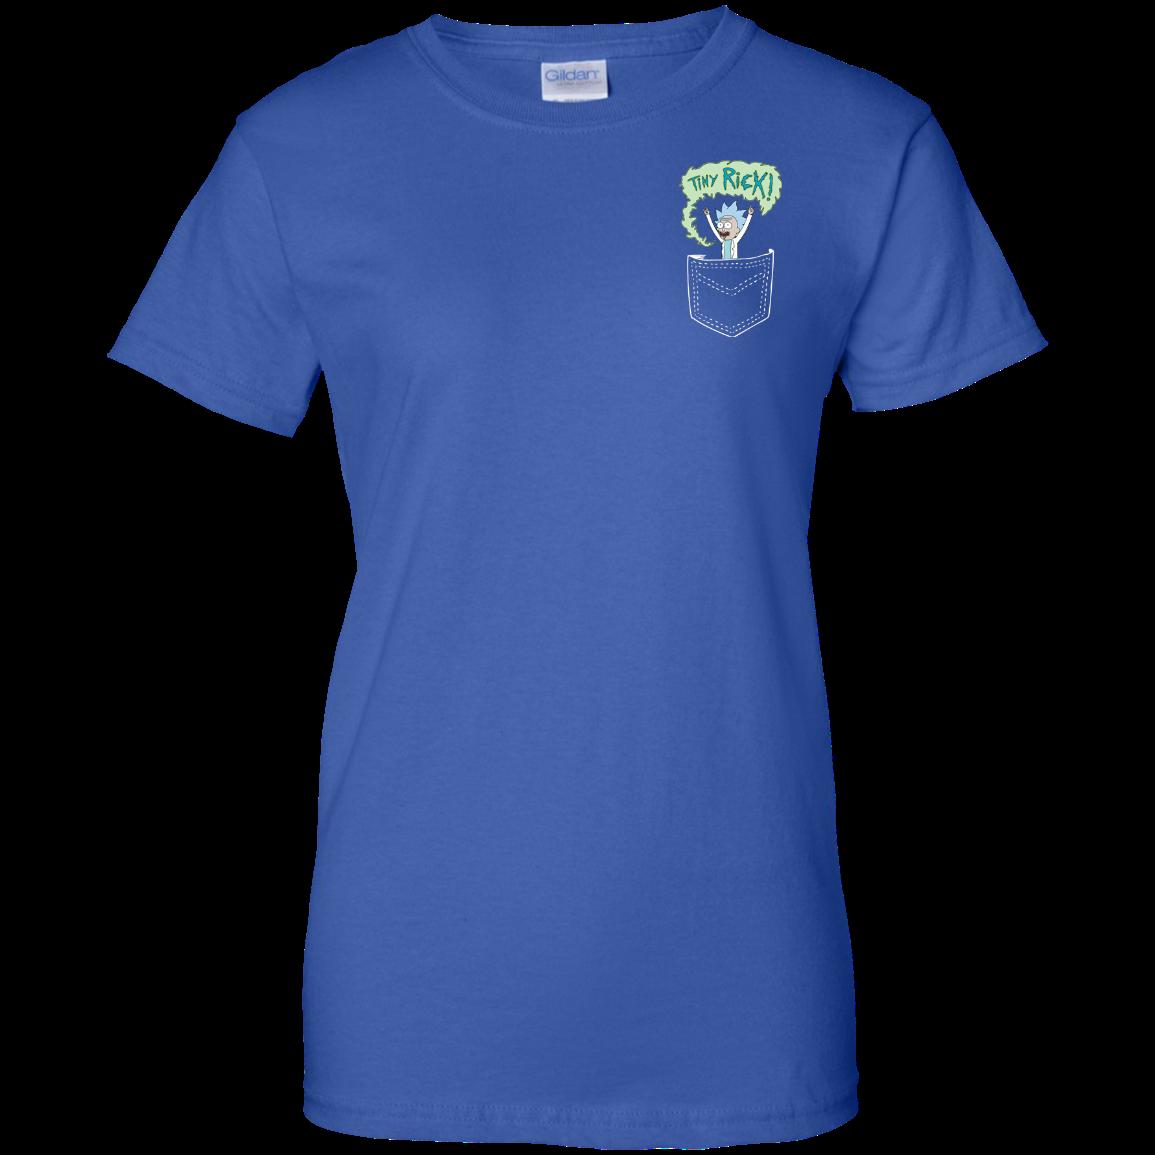 image 907px Rick and Morty: Tiny Rick Pocket T Shirt